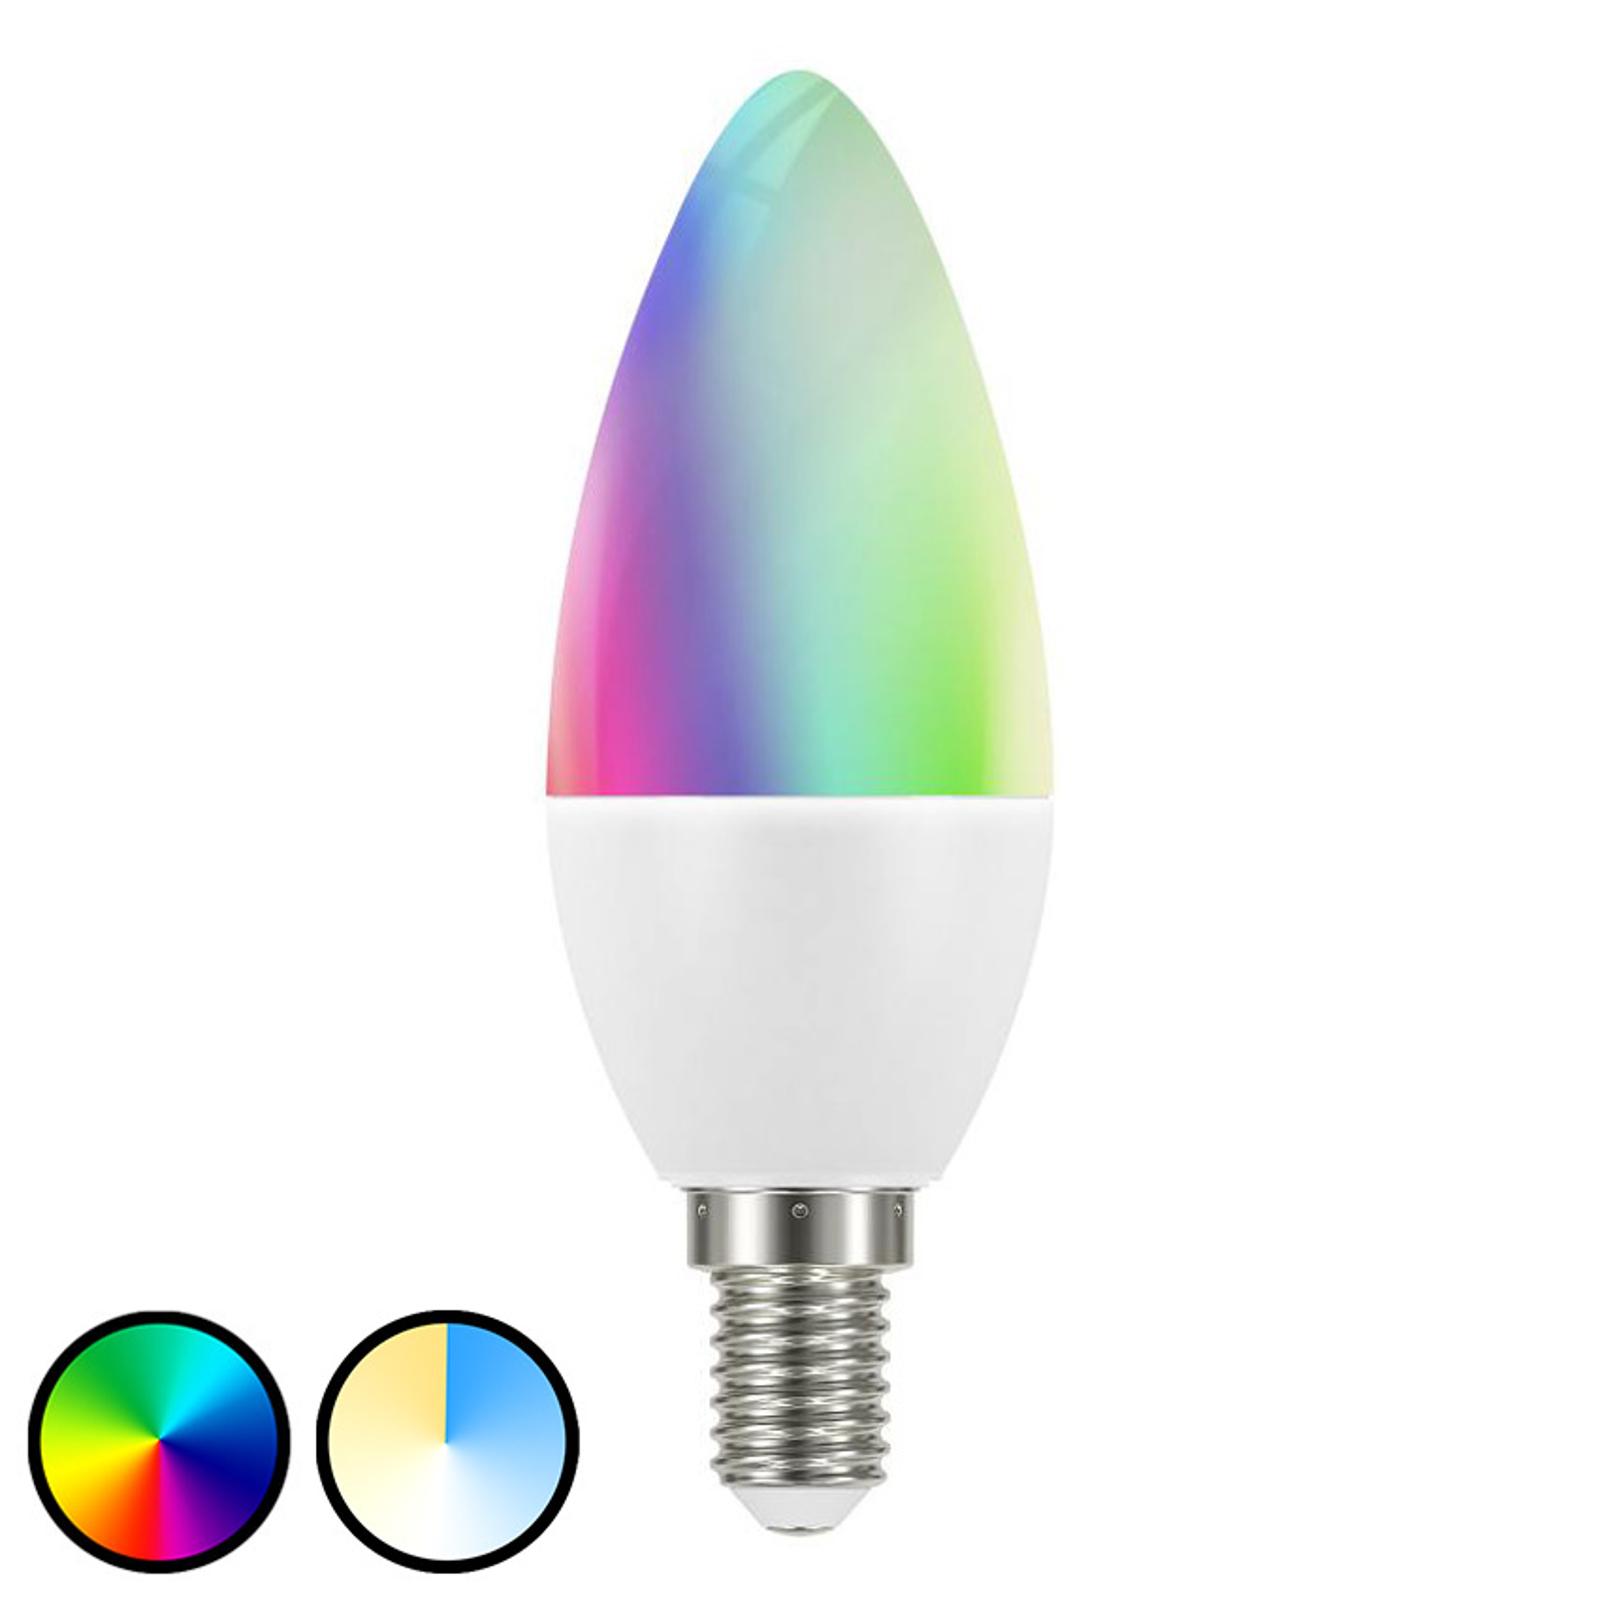 Müller Licht tint white+color LED-Lampe E14 6W